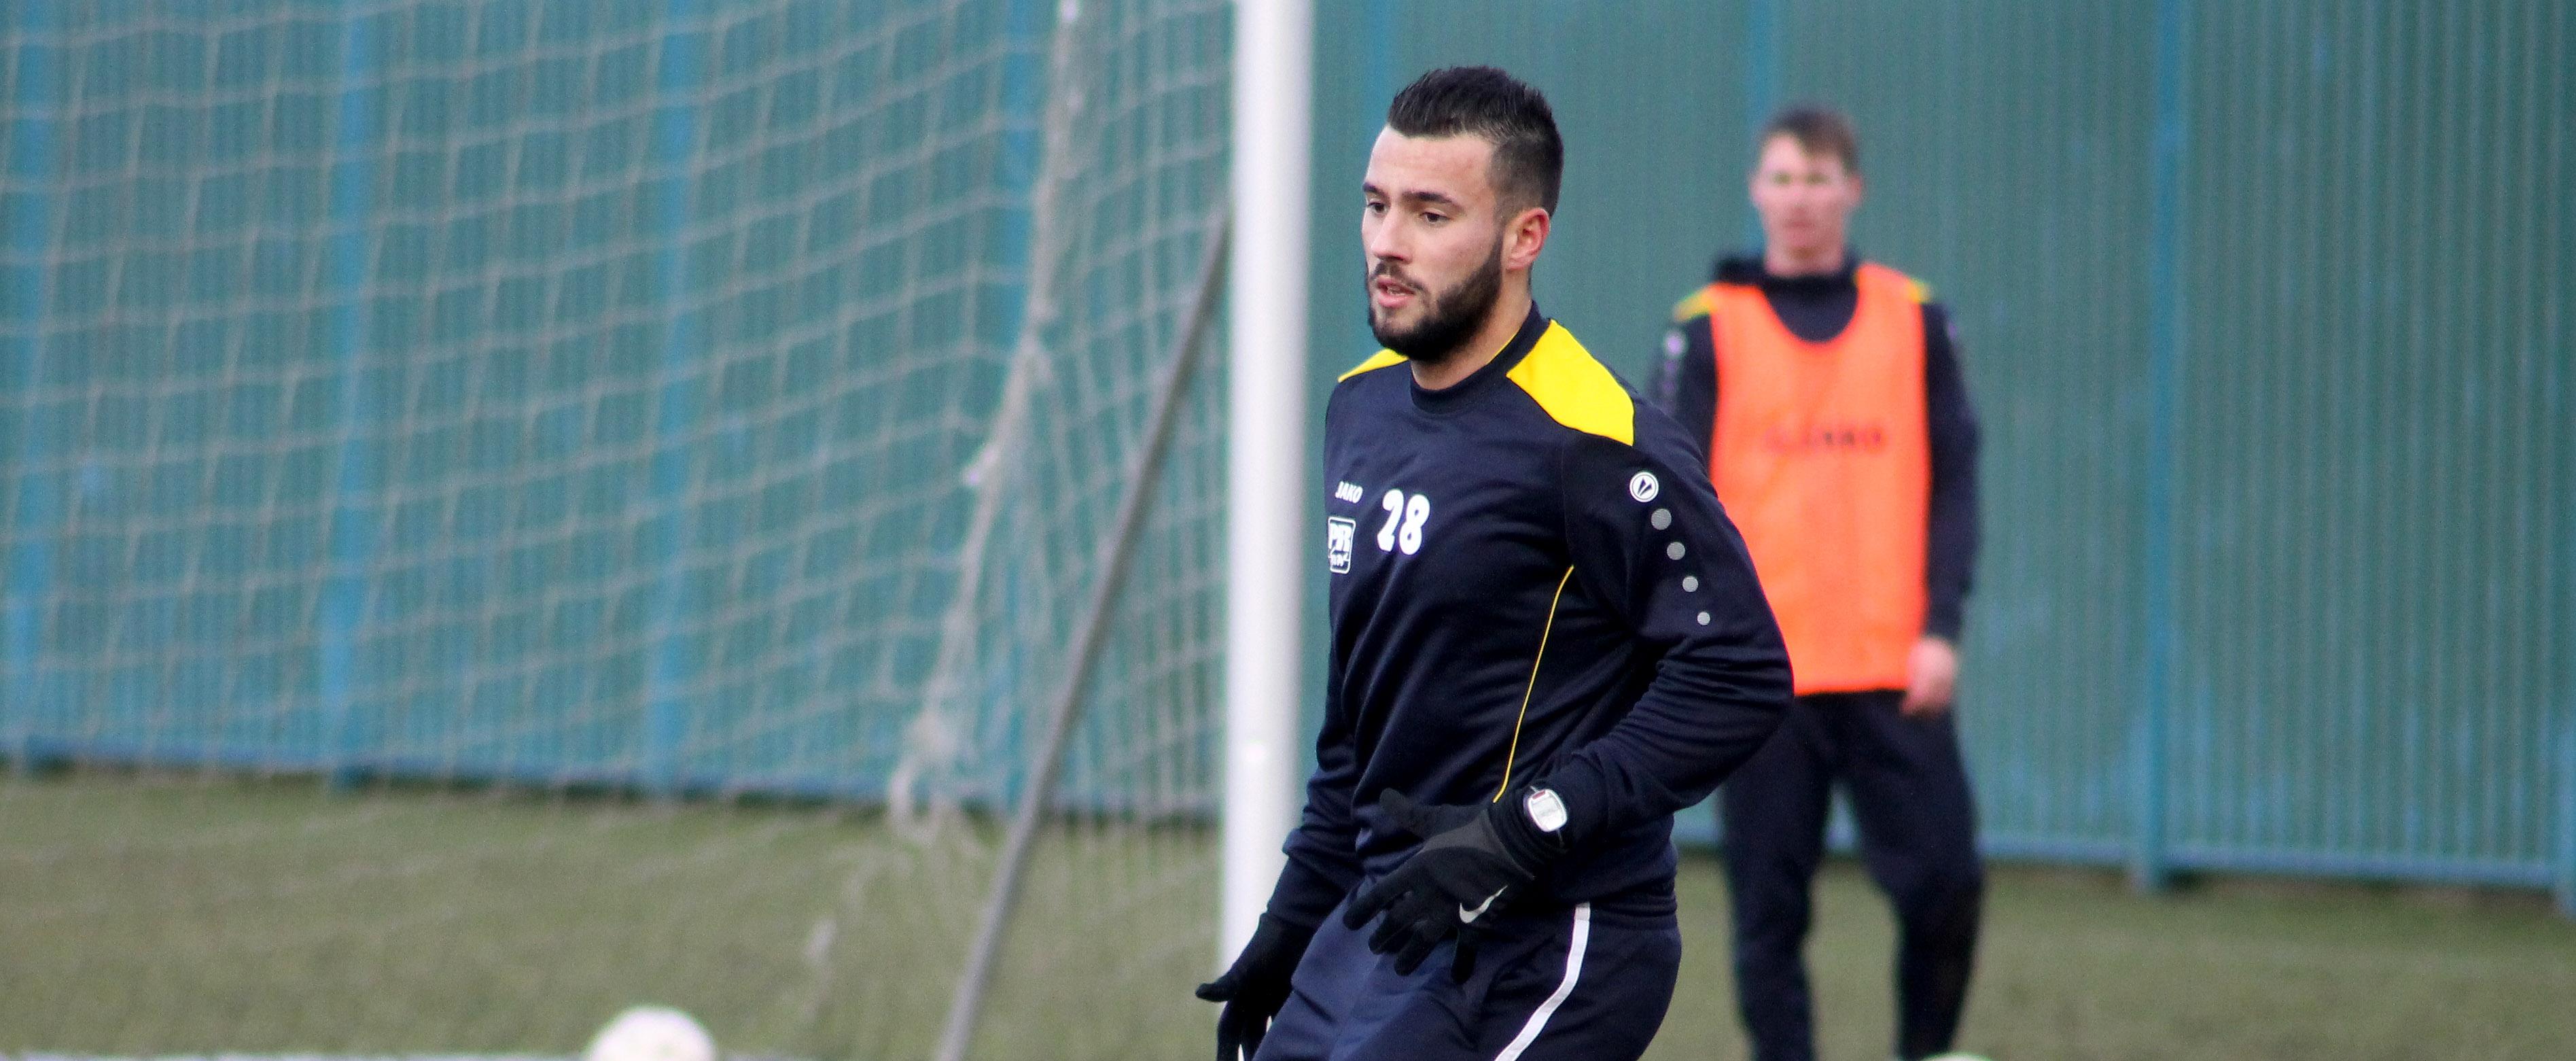 [Interview] Floriano Vanzo : « Bongonda et Bakkali sont l'avenir de la Belgique »